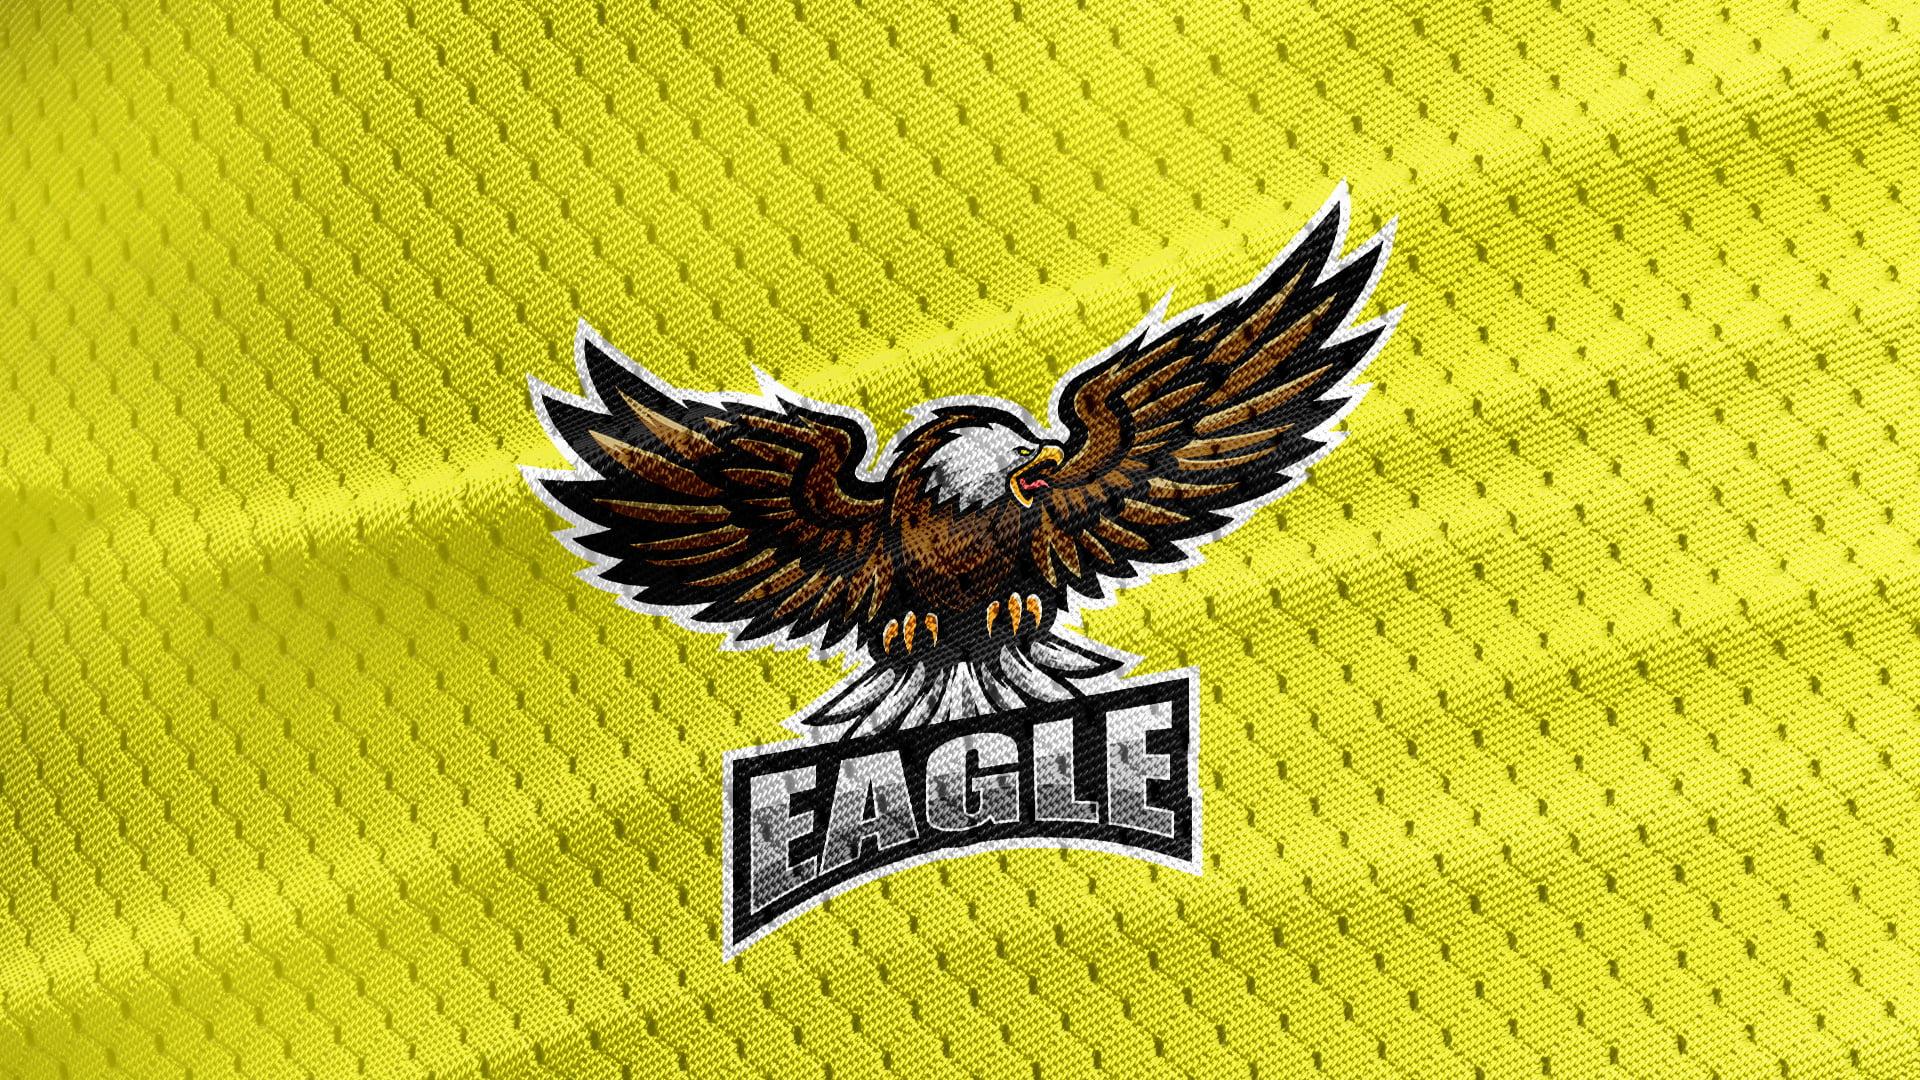 Free-Eagle-Mascot-Jersey-Texture-Logo